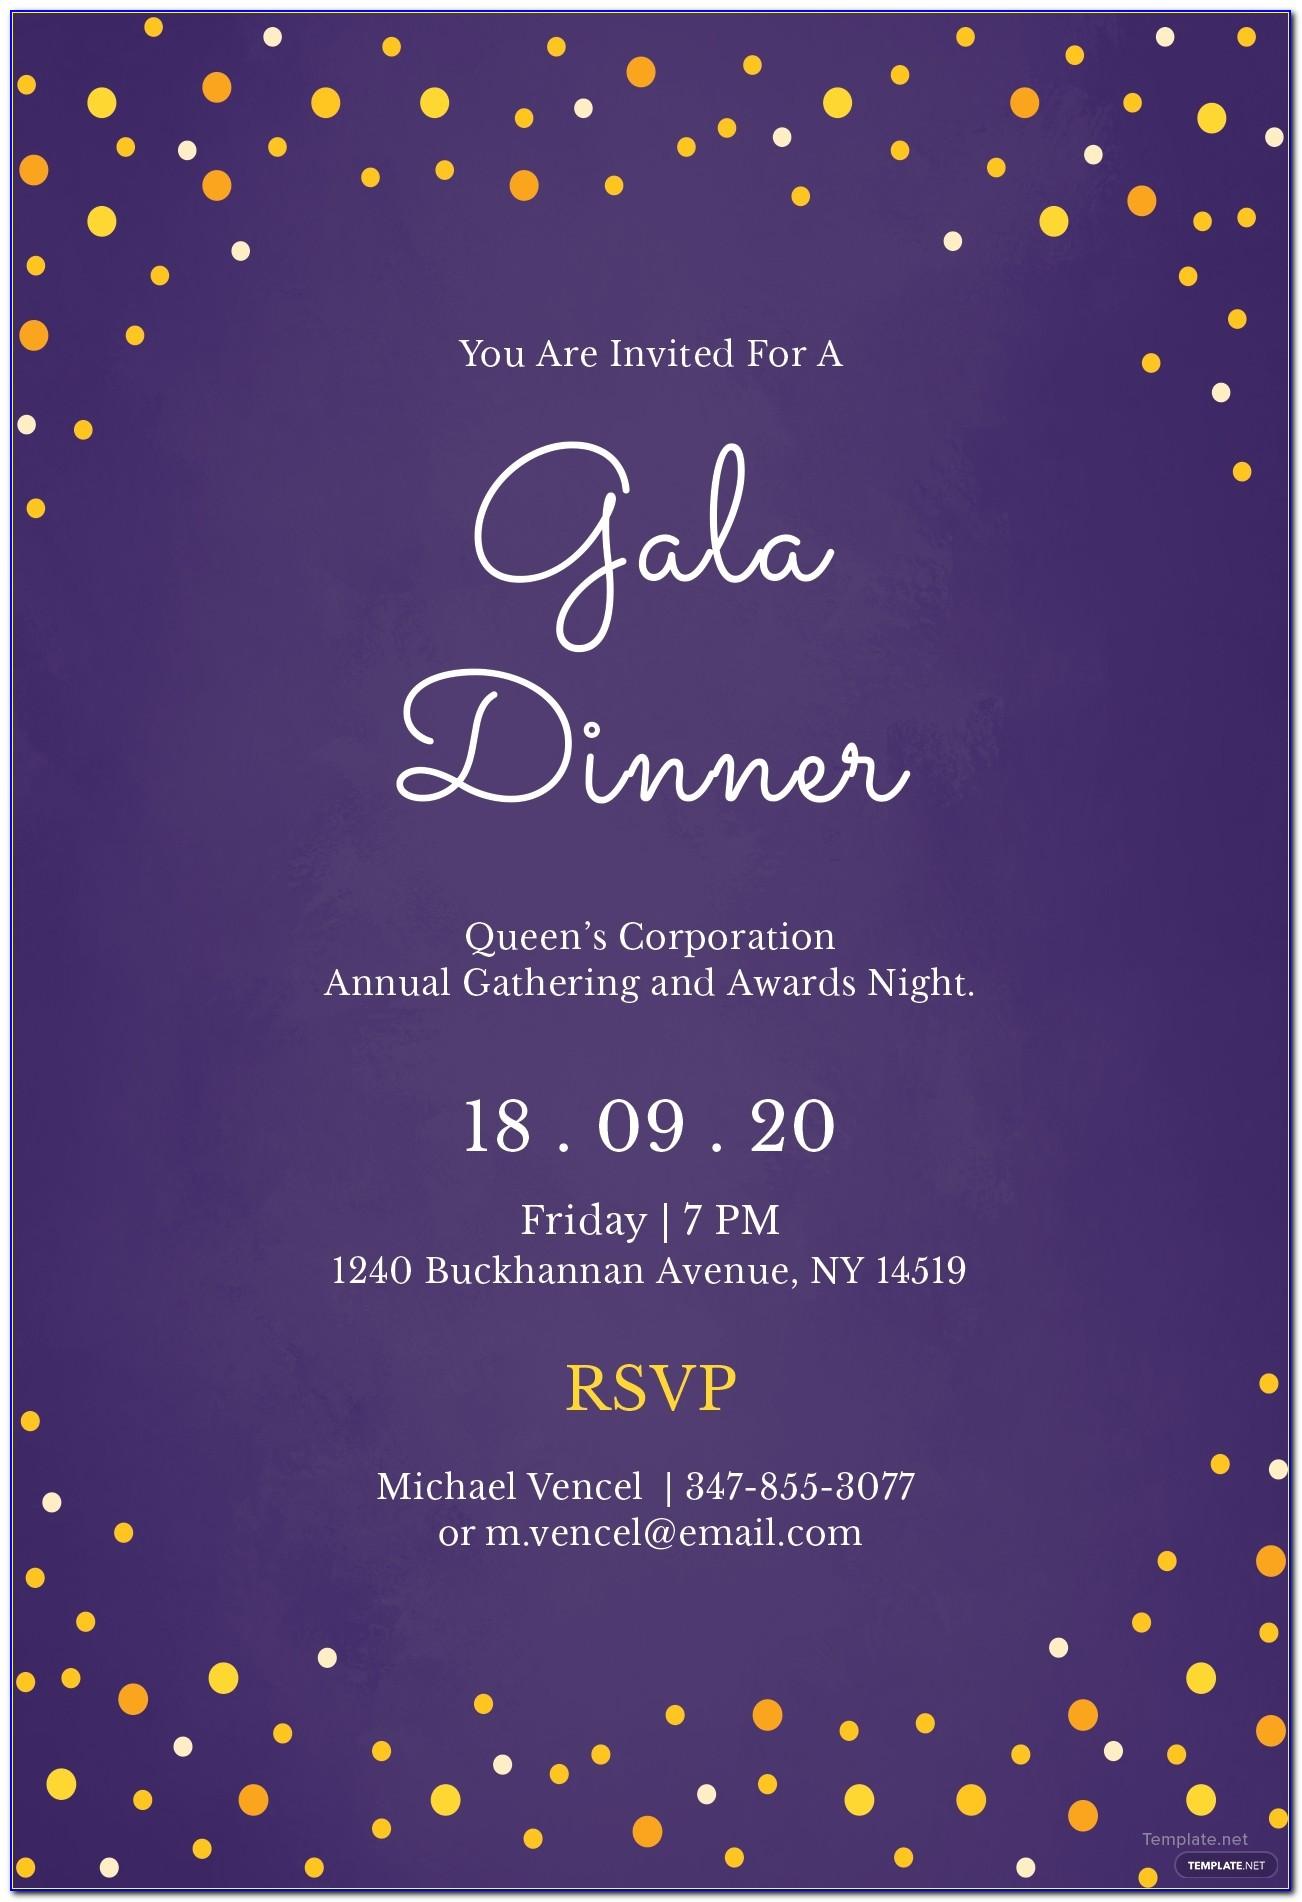 Gala Dinner Invitations Templates